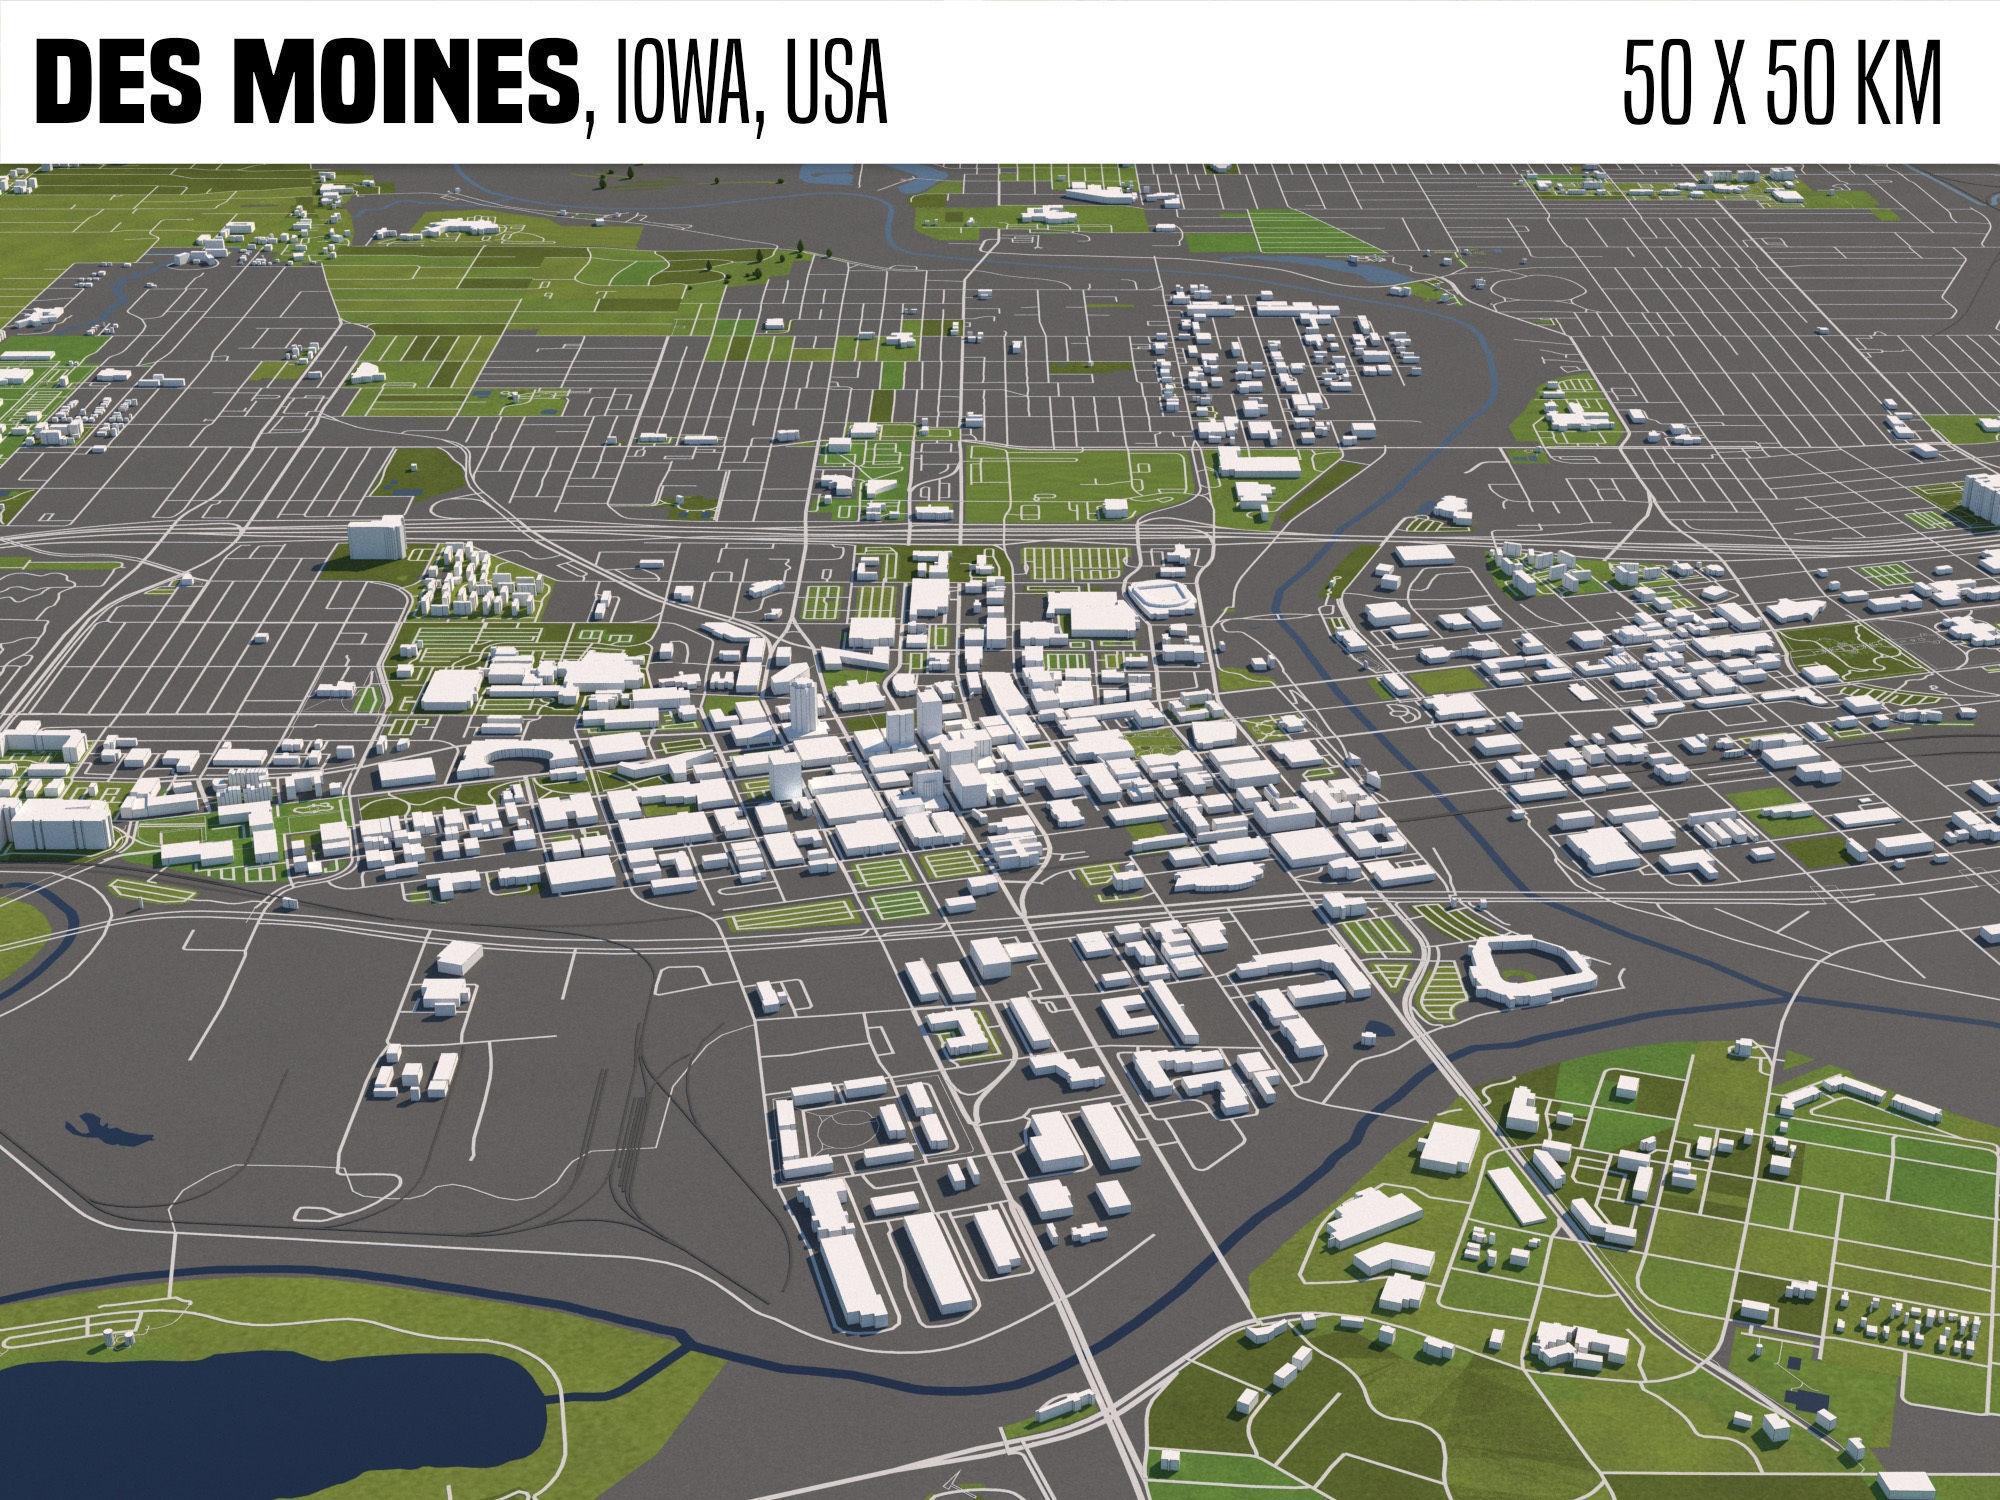 De Moines Iowa USA 50x50km